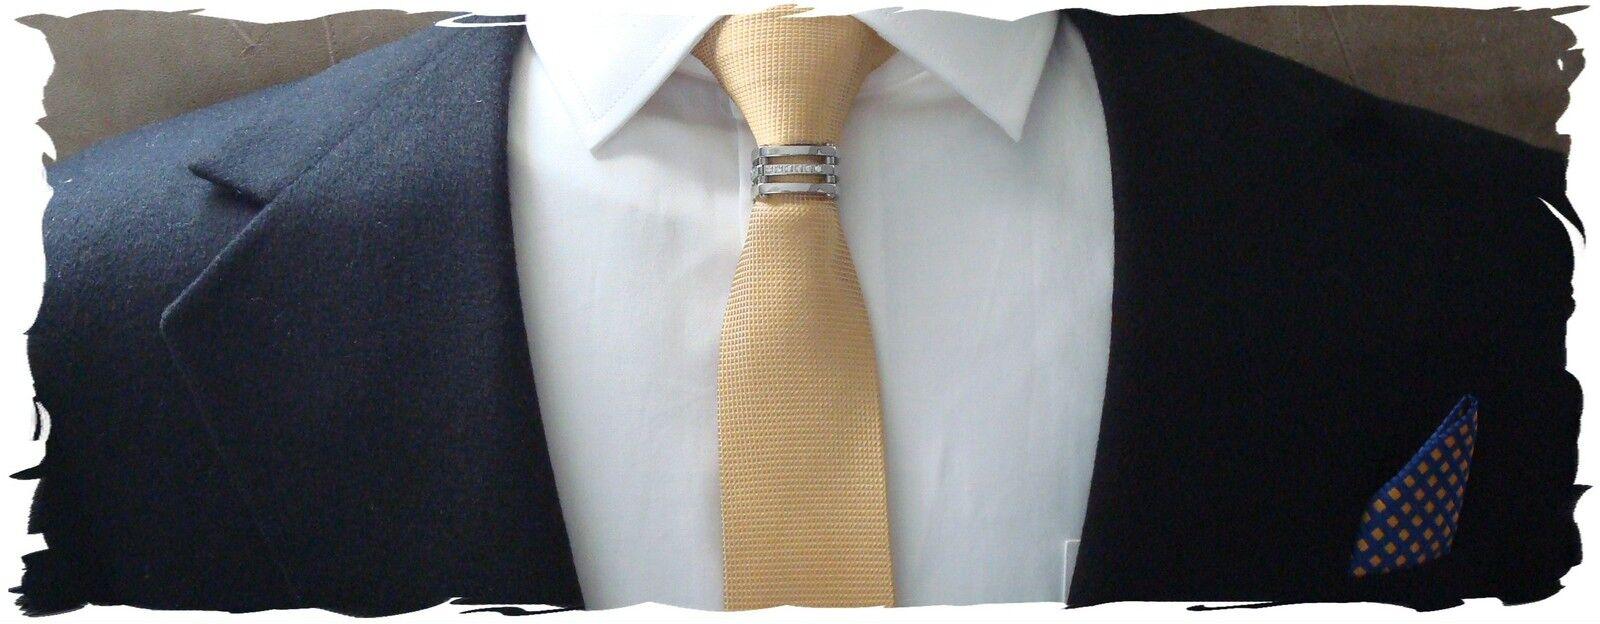 Tie Bling